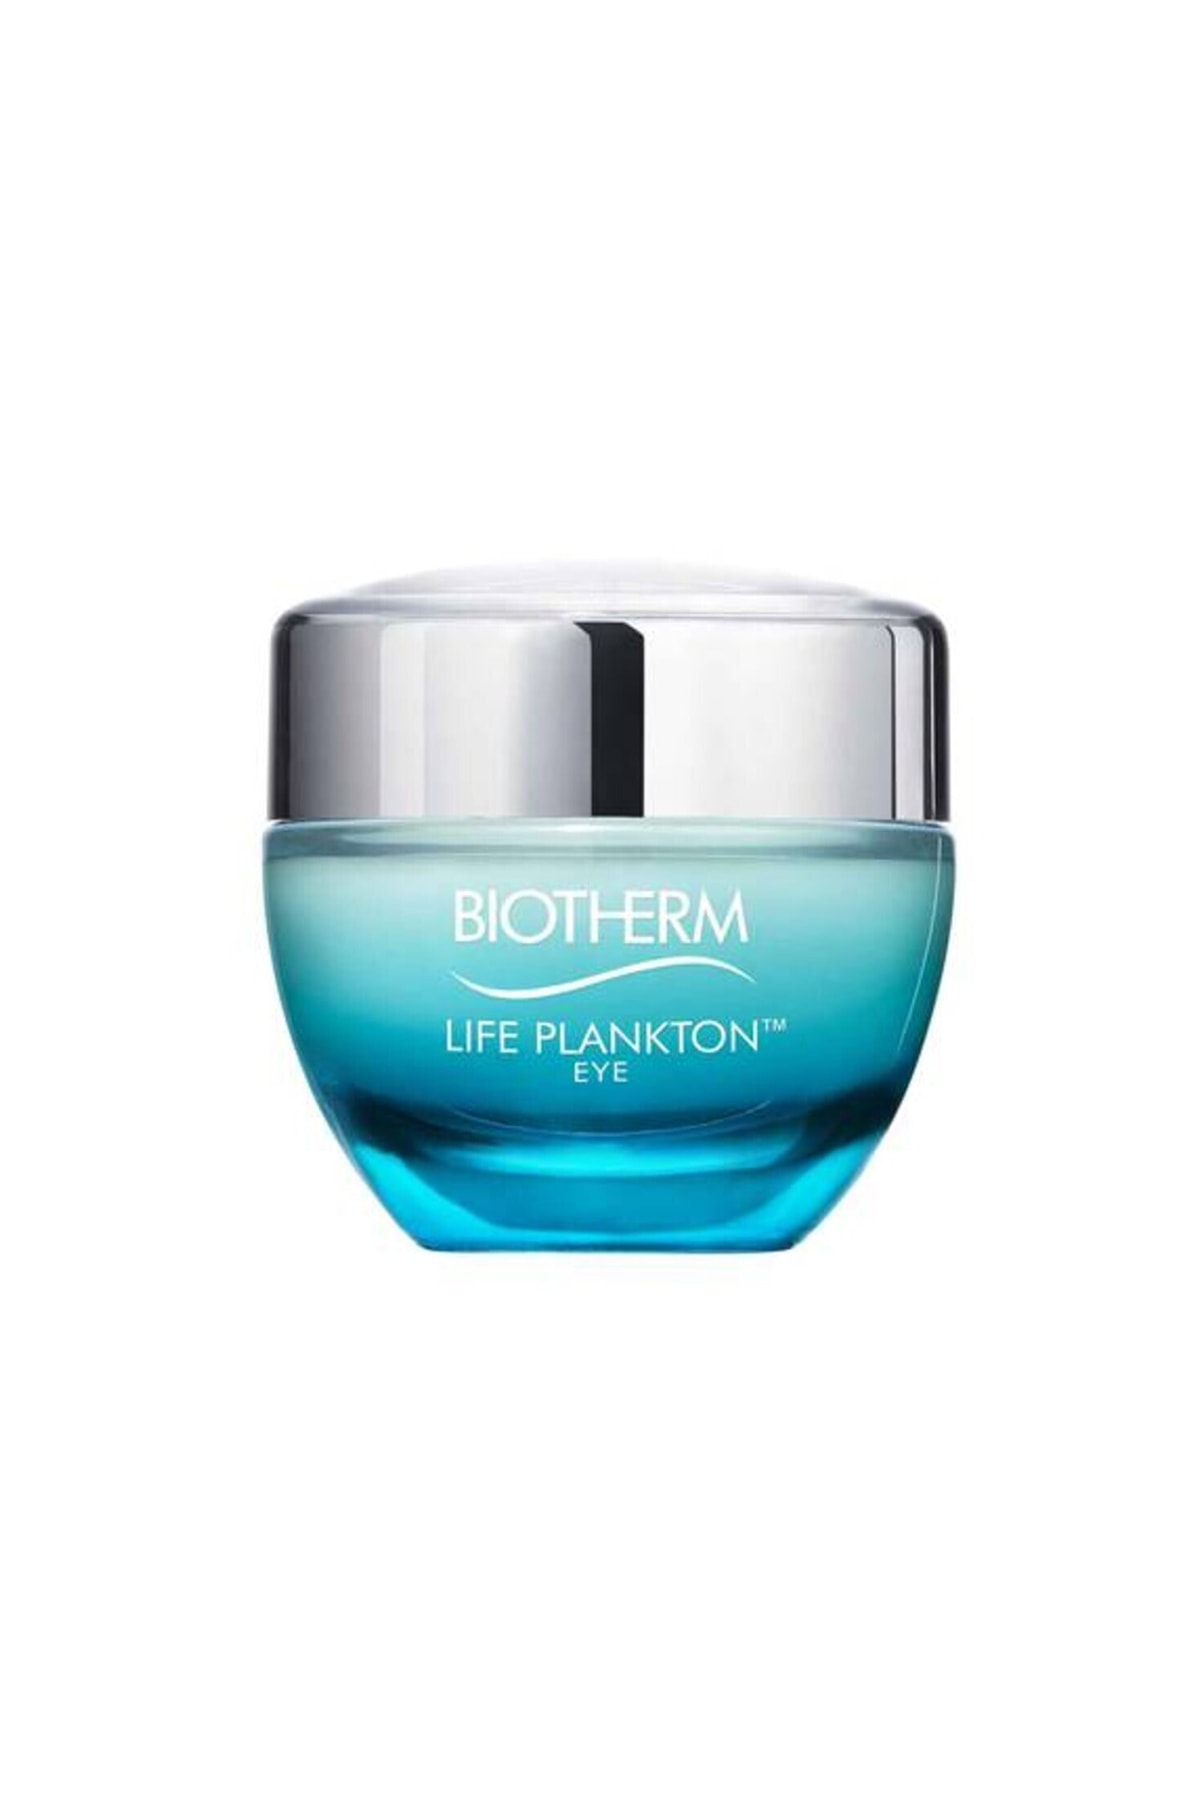 Biotherm Life Plankton Göz Kremi 15 ml 1